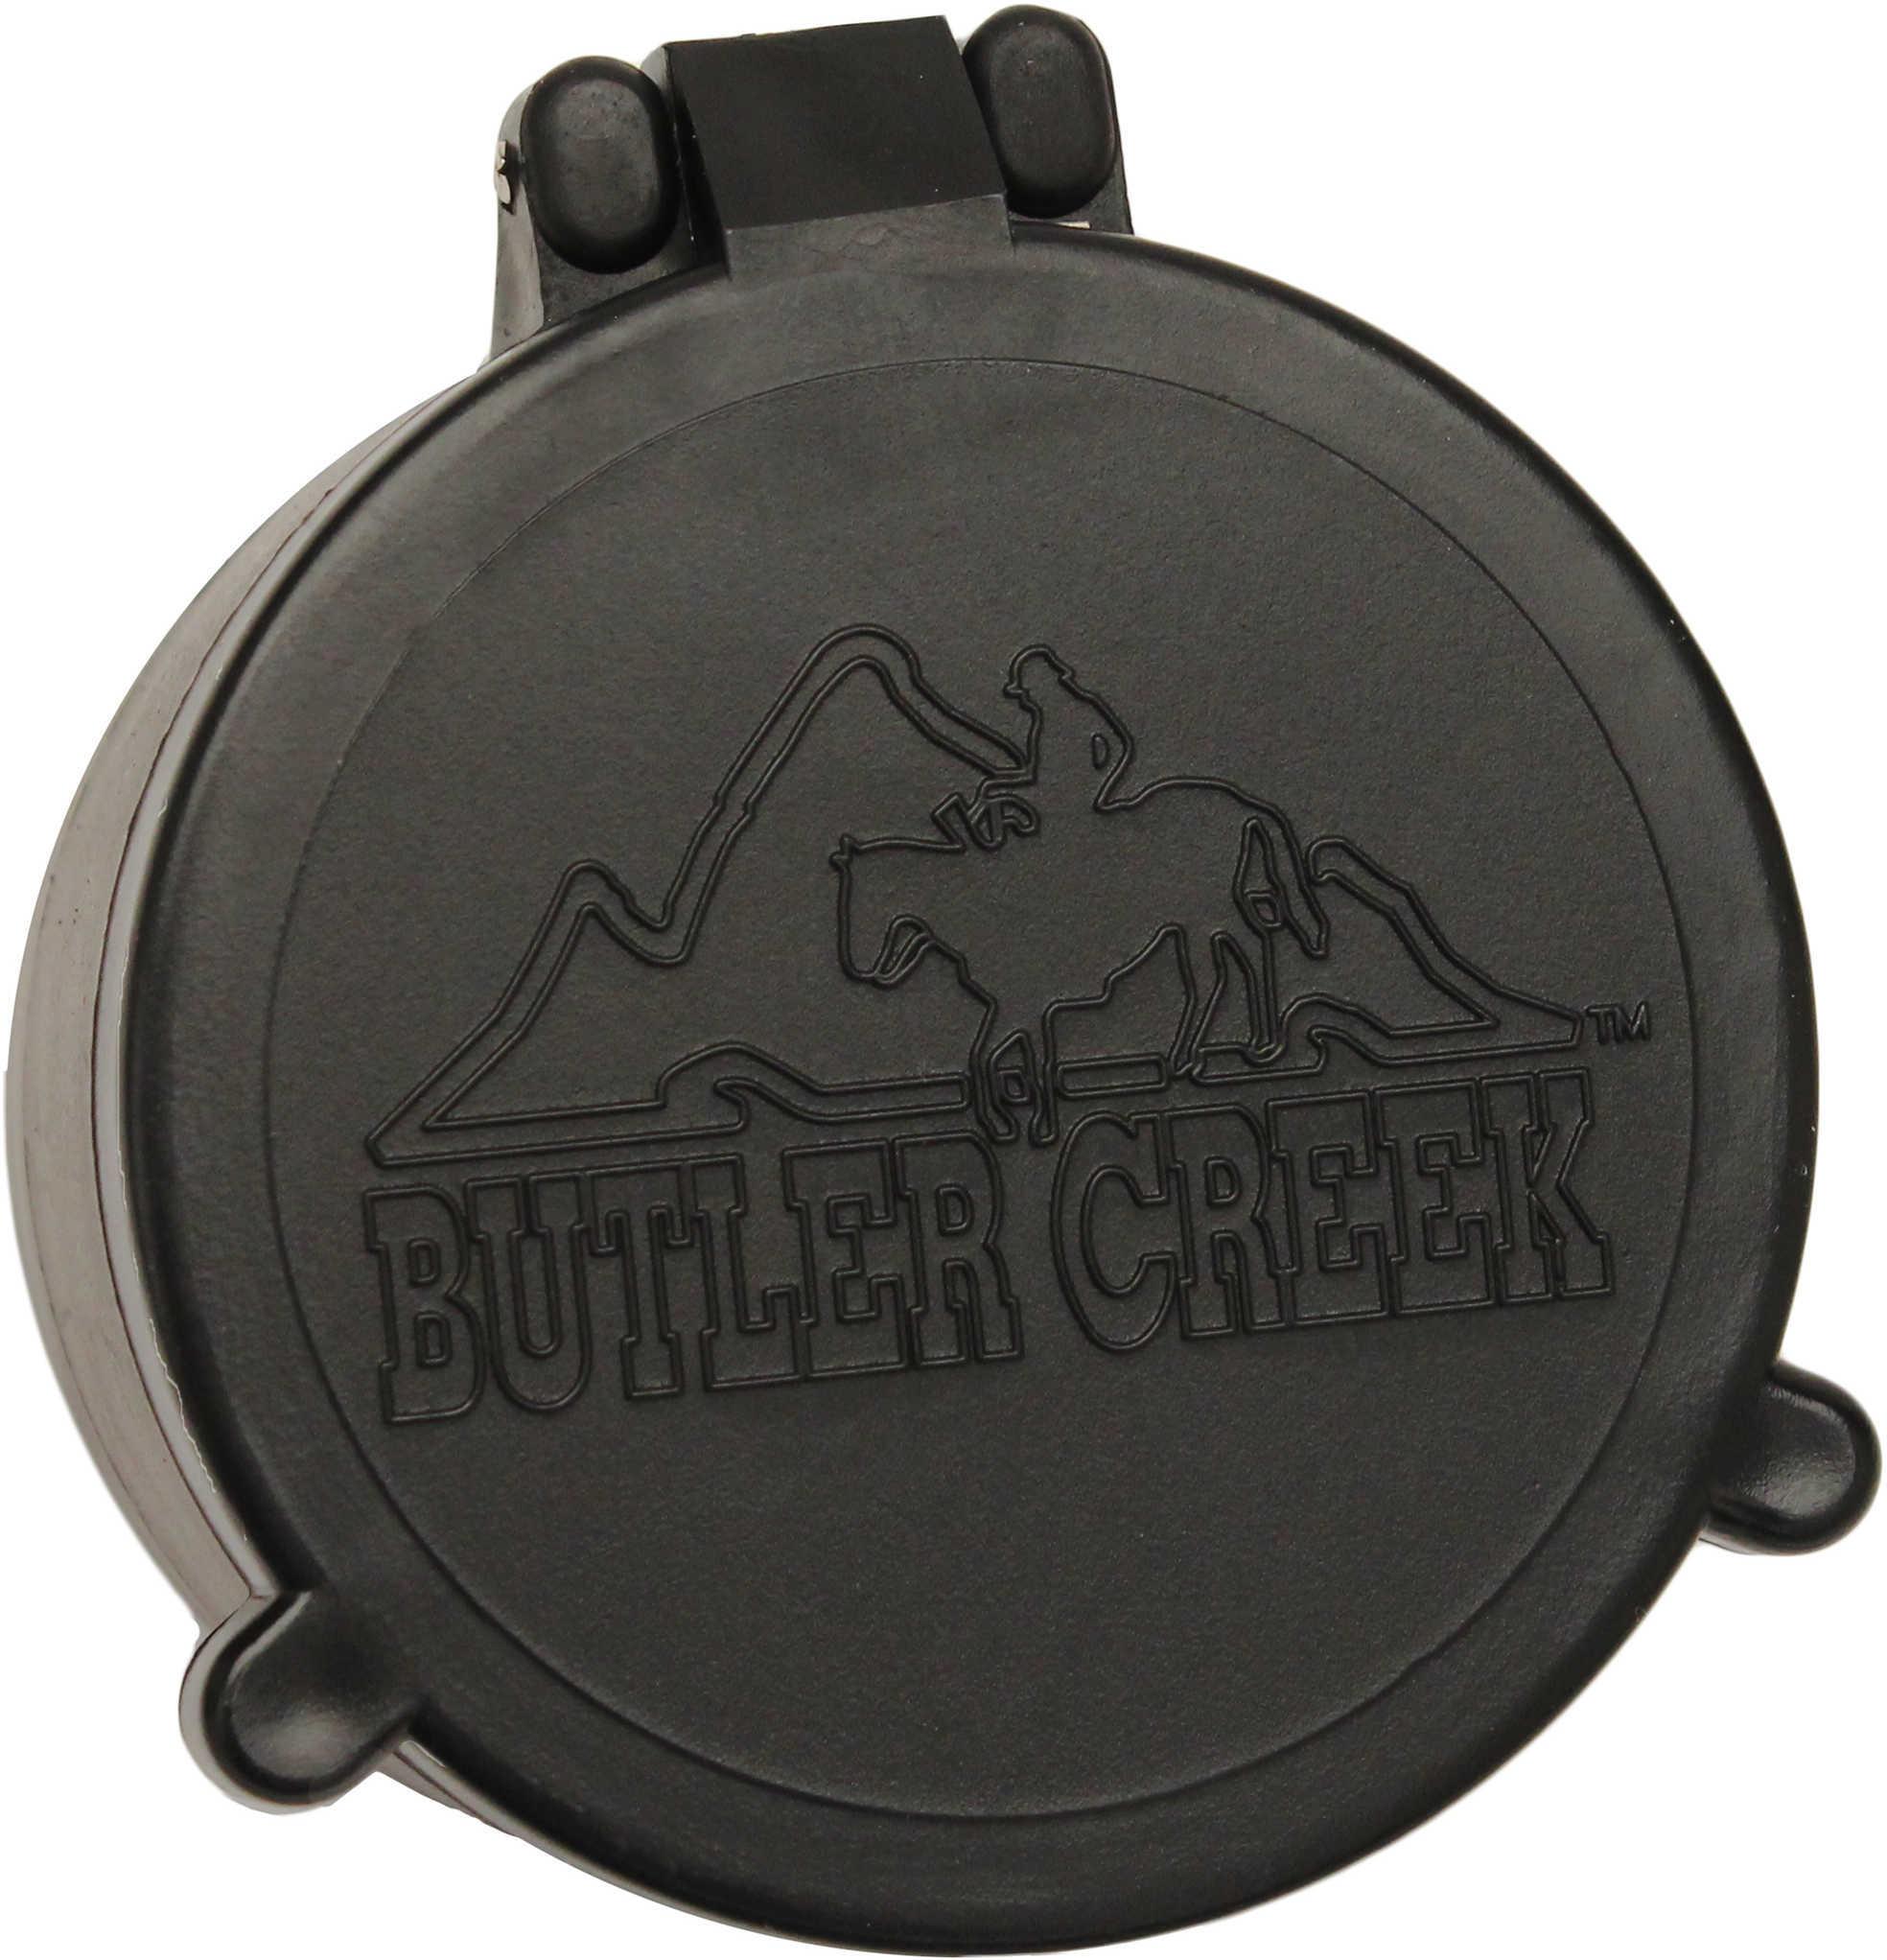 Butler Creek Flip Open Scope Cover - Objective Size 05 Md: 30050